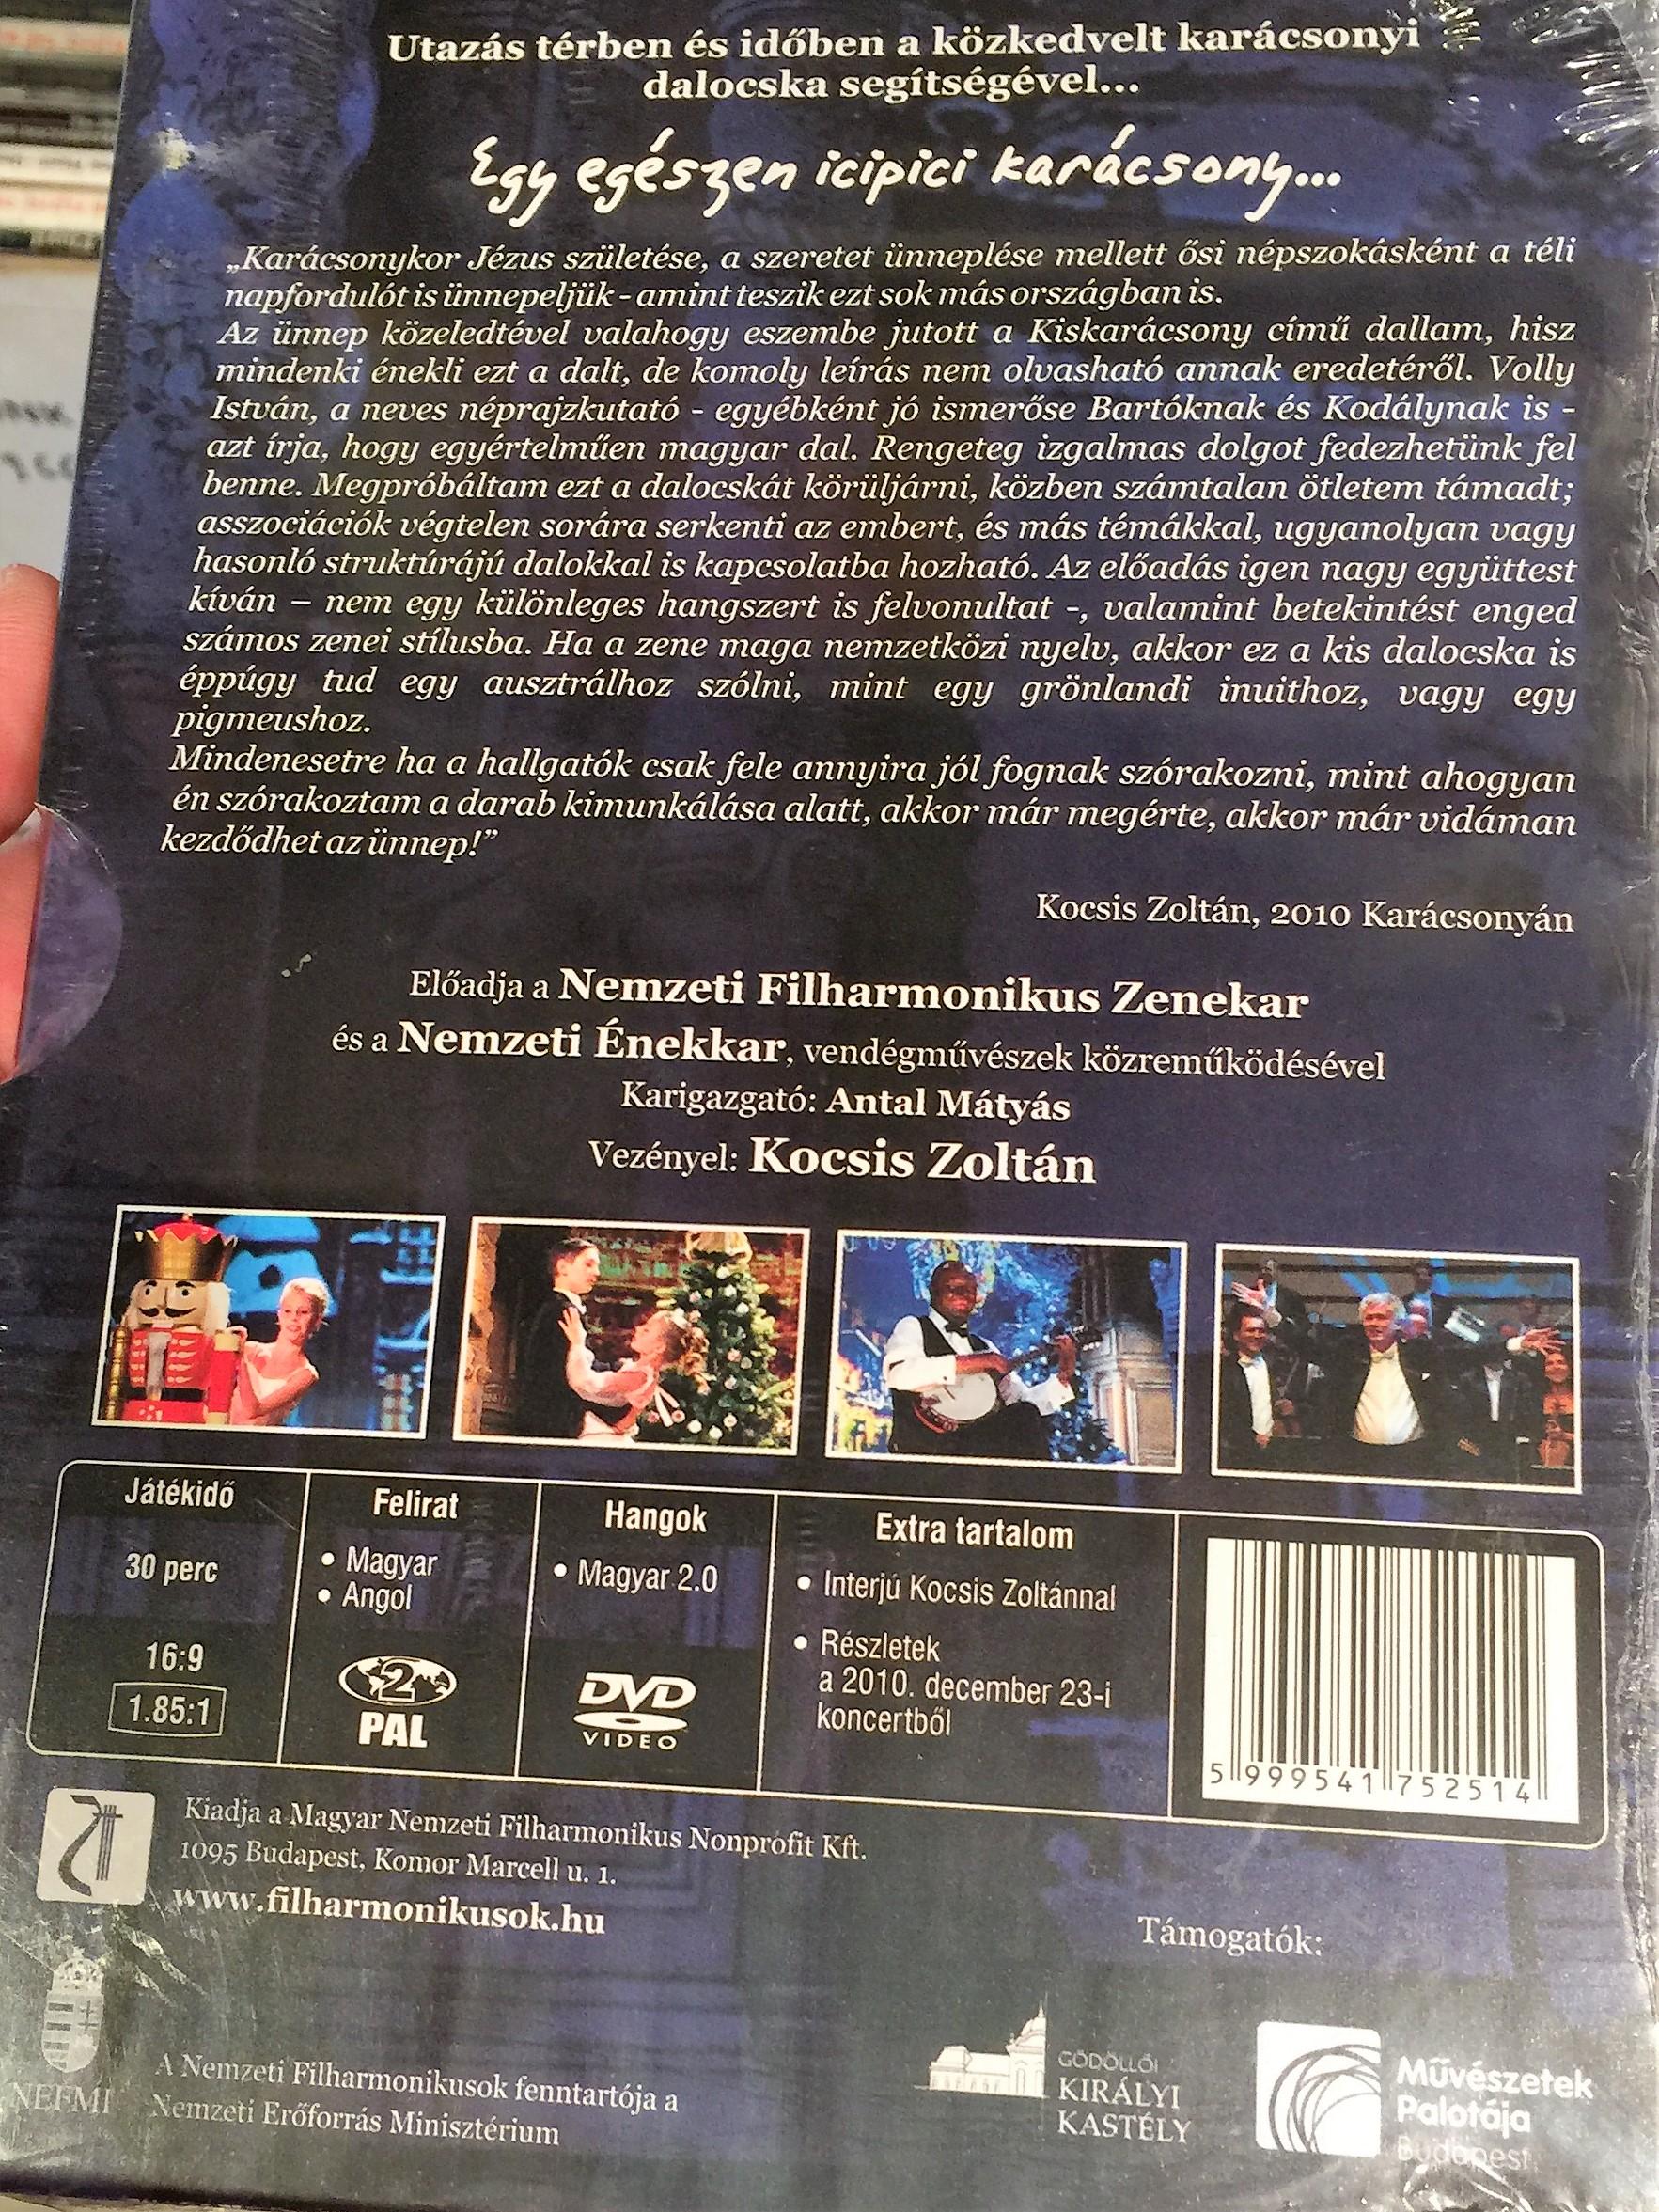 kocsis-zolt-n-kiskar-csony-nagykar-csony-dvd-2010-v-ltozatok-egy-magyar-dalra-variations-on-a-hungarian-song-national-philharmonic-orchestra-hungary-directed-by-kocsis-zolt-n-2-.jpg